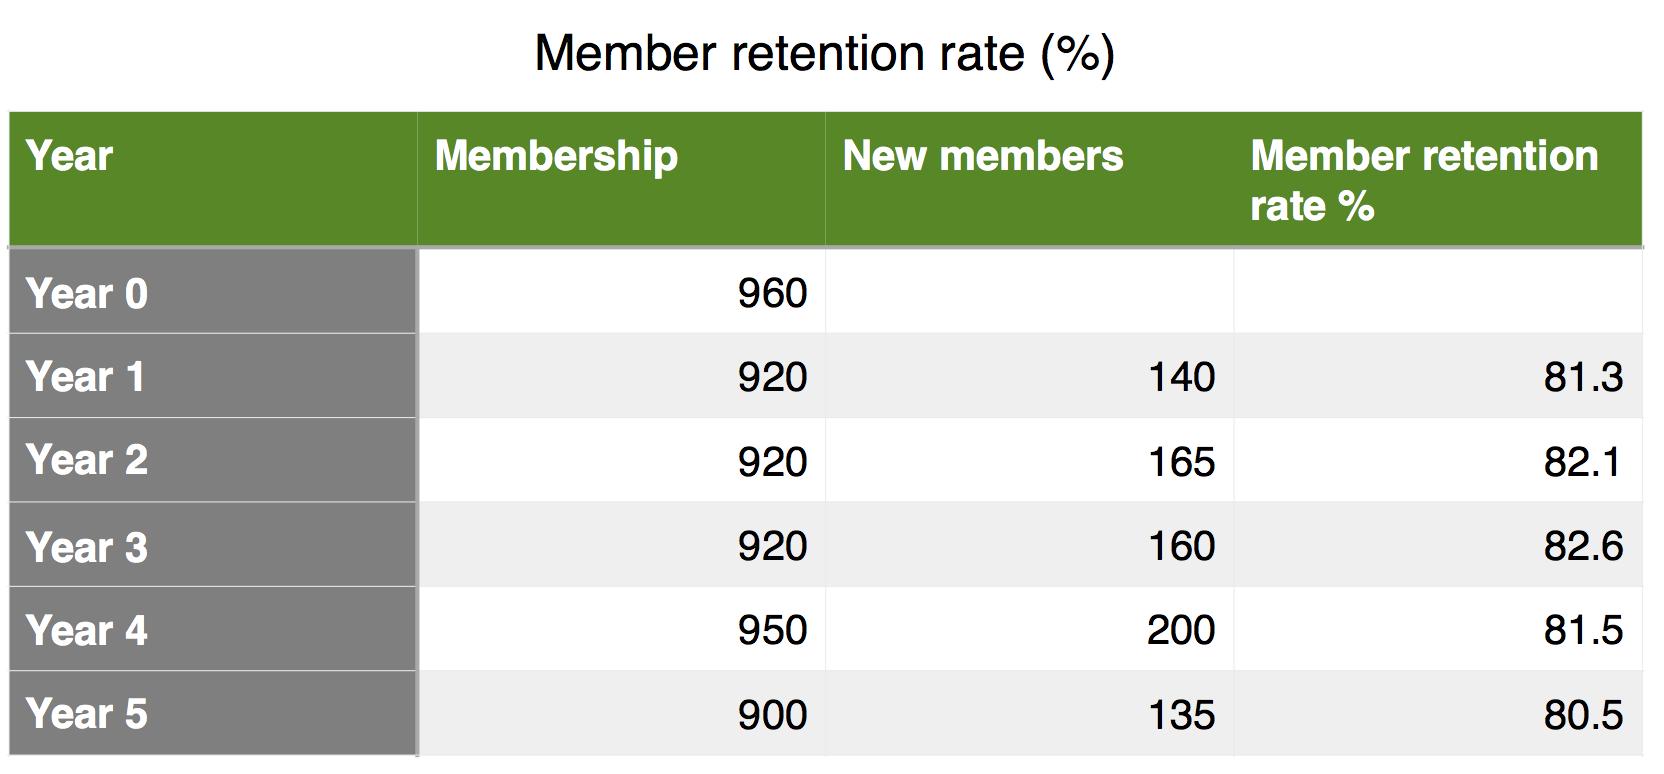 Membership retention rates